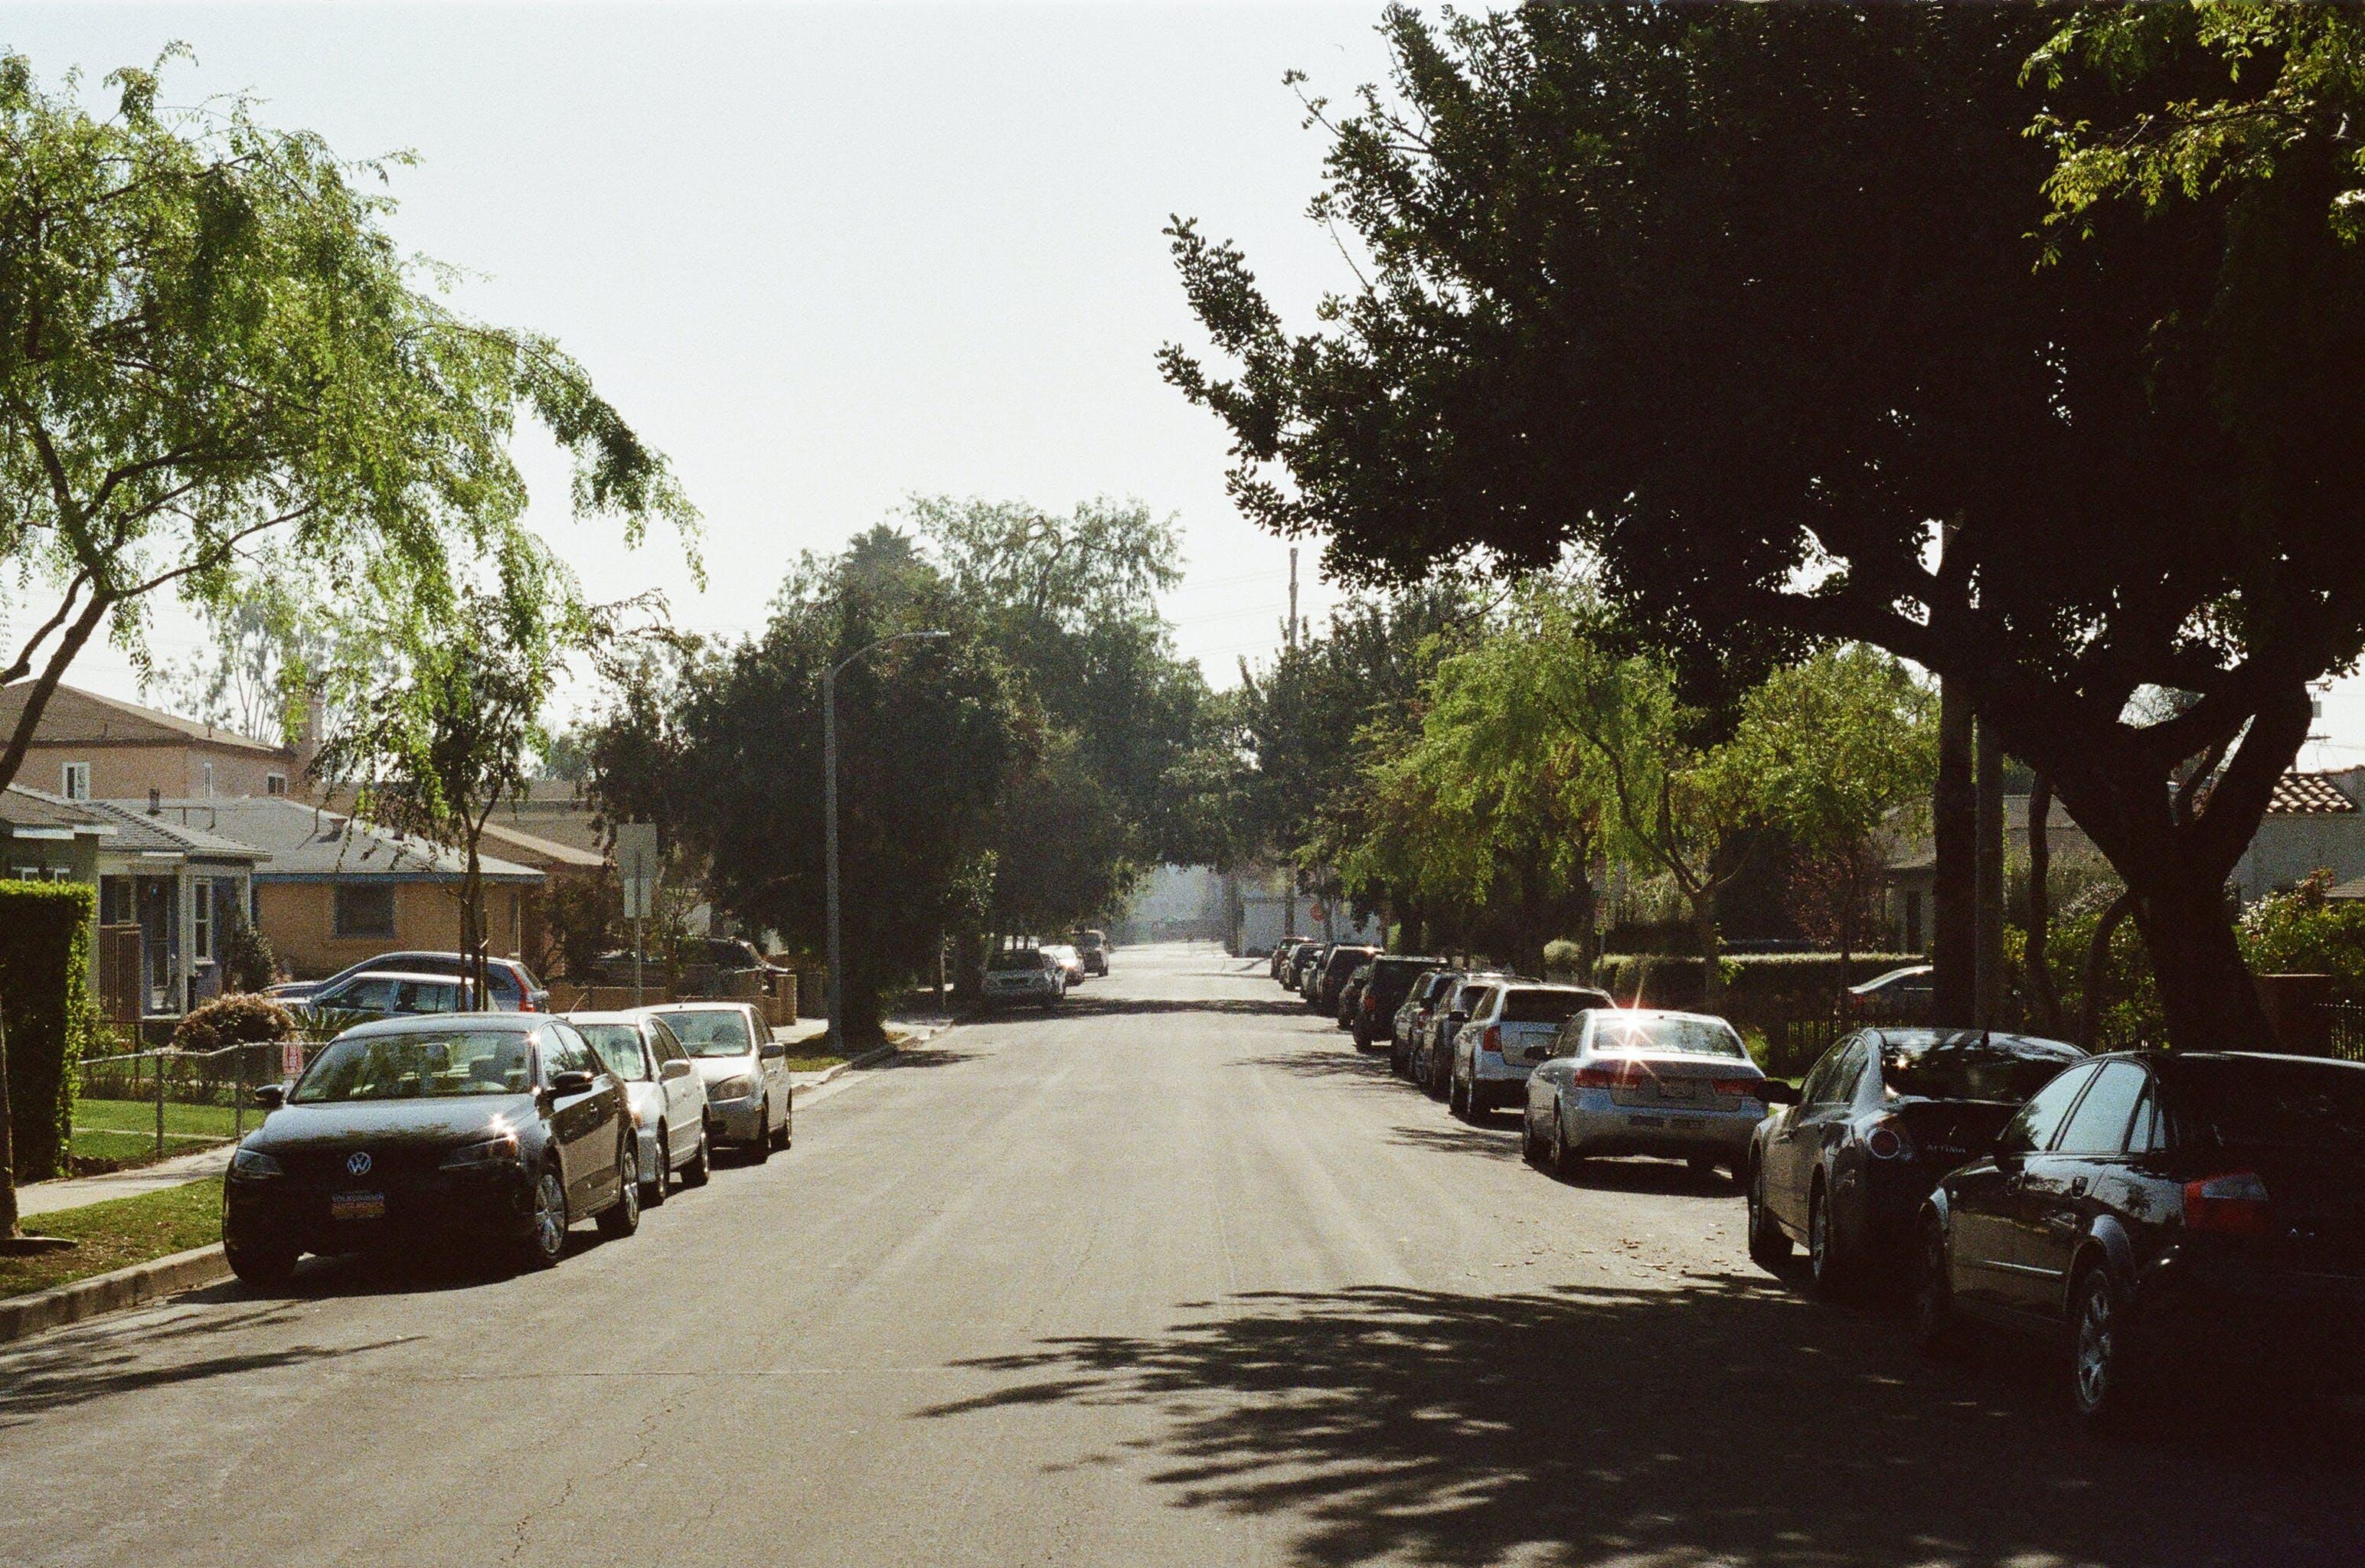 Parked Vehicle Beside Sidewalk